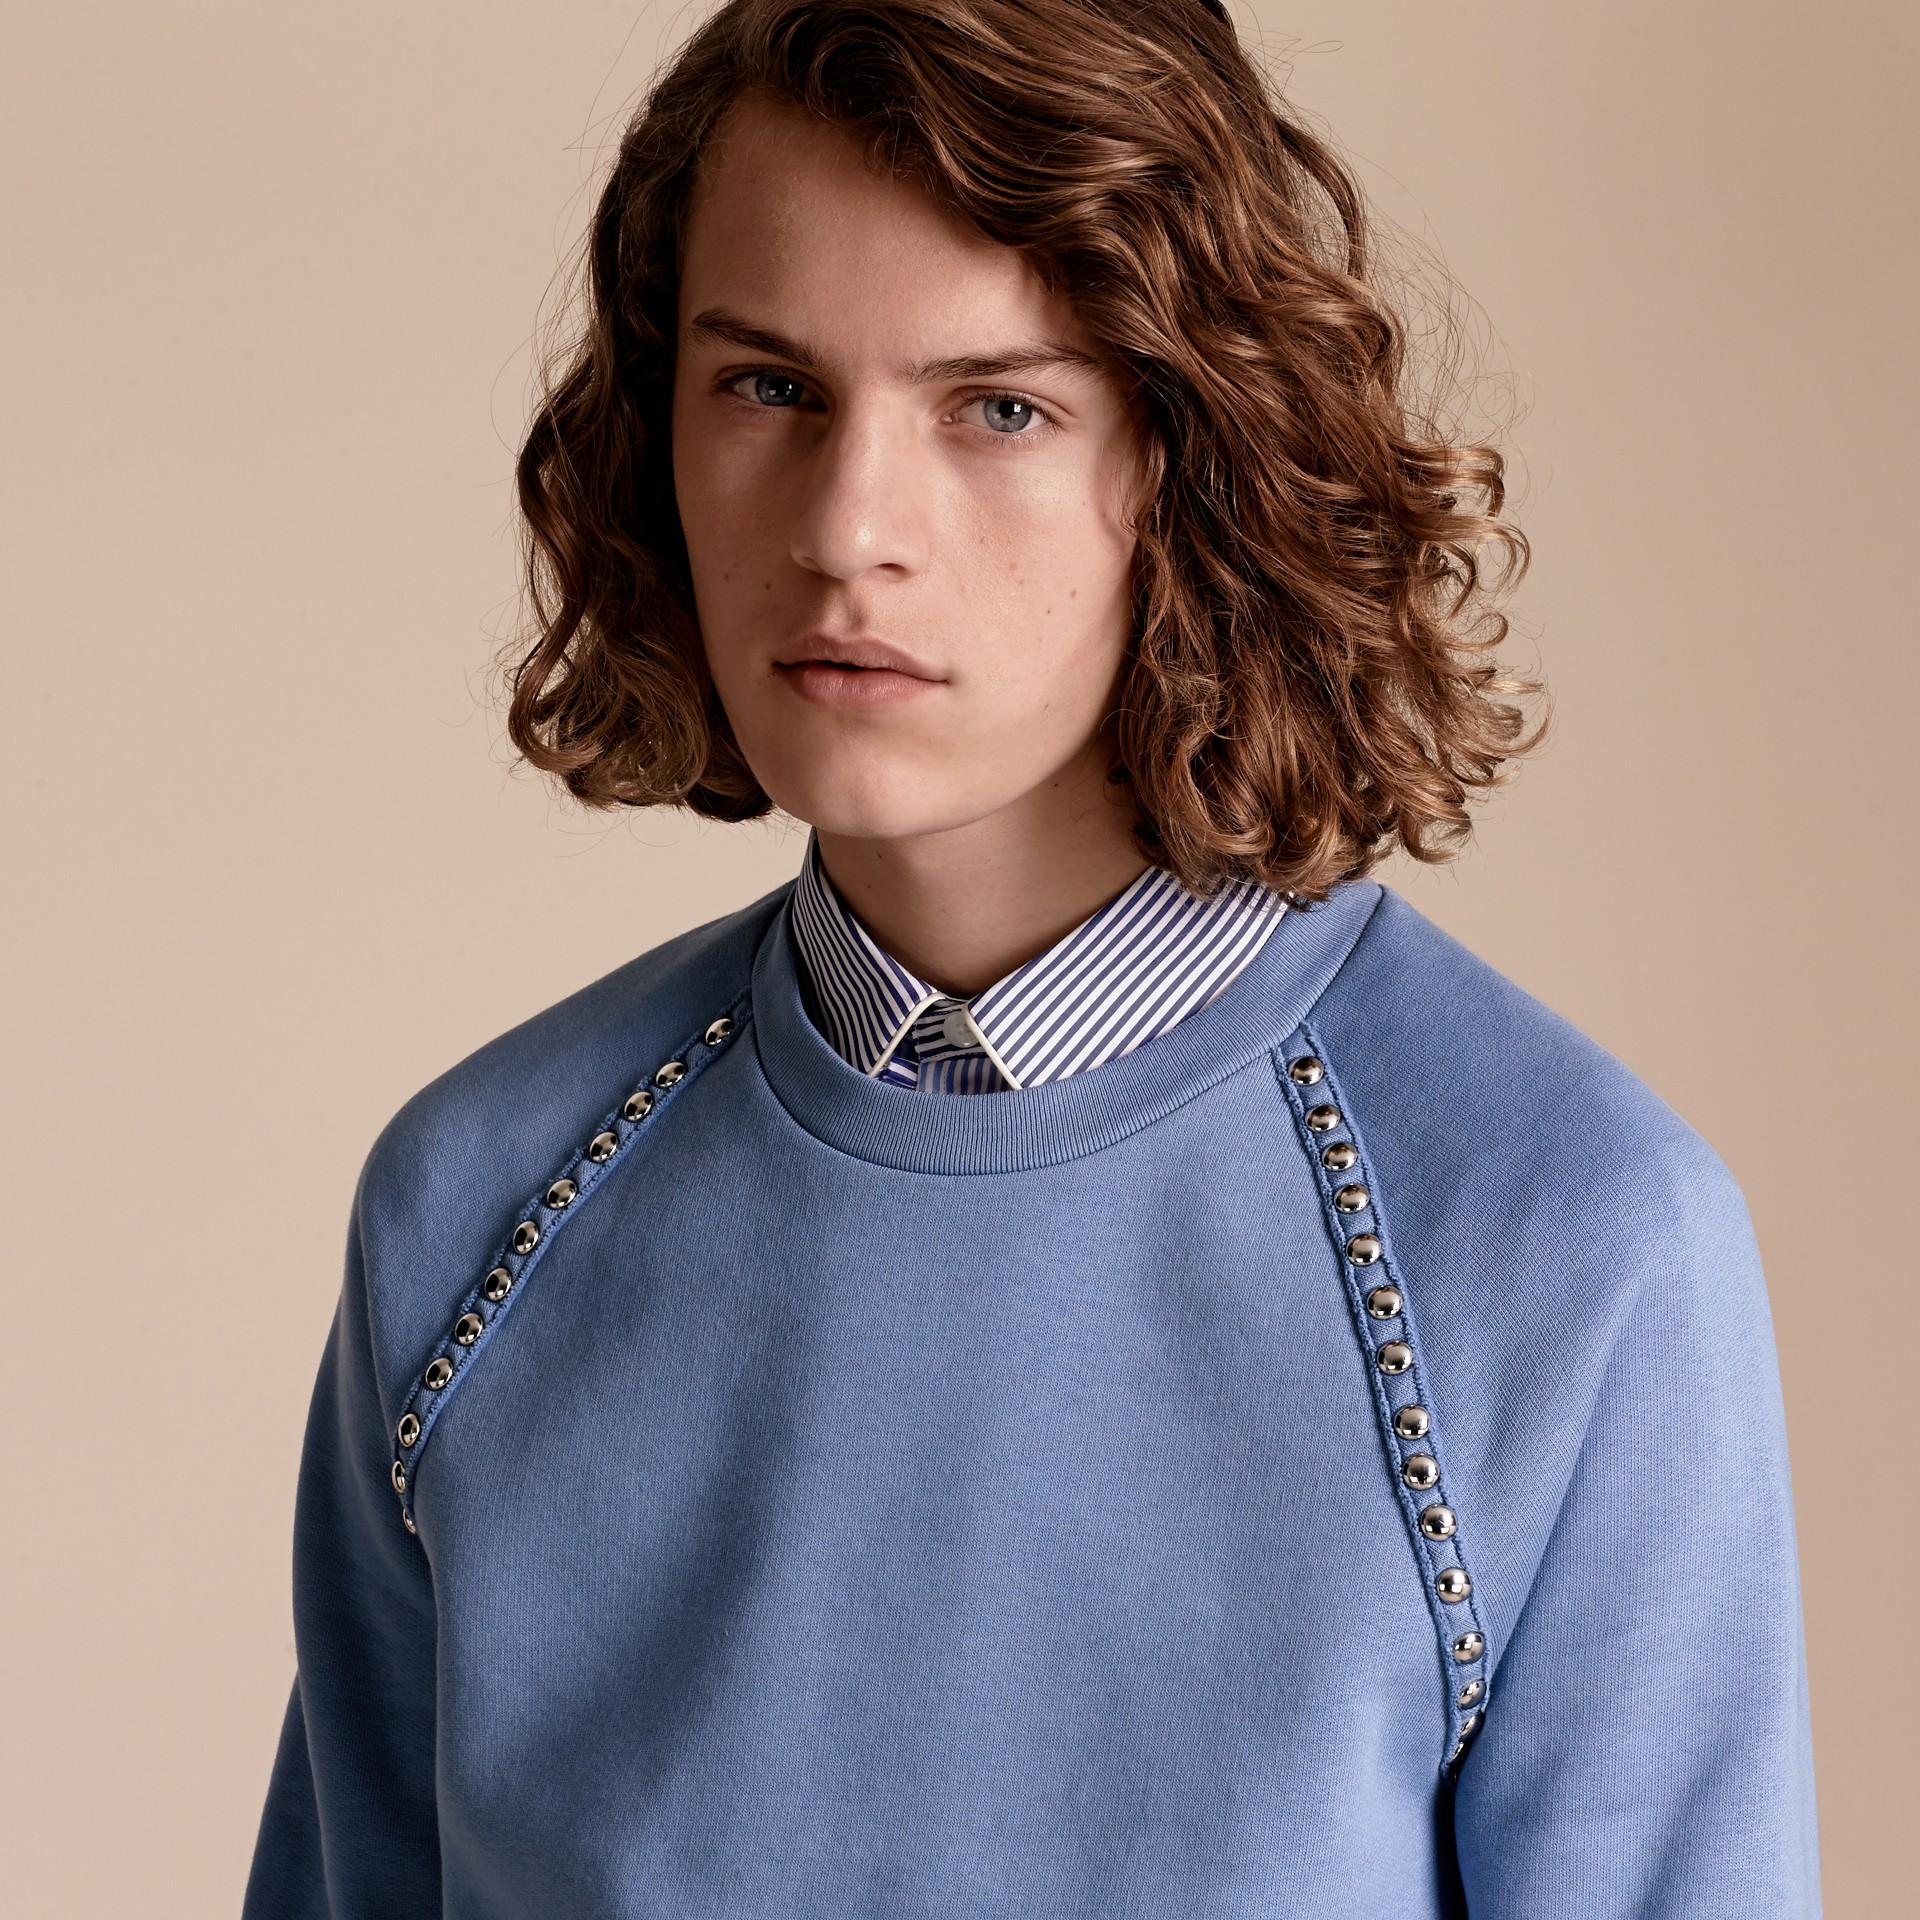 Stud Detail Cotton-blend Sweatshirt - gallery image 5